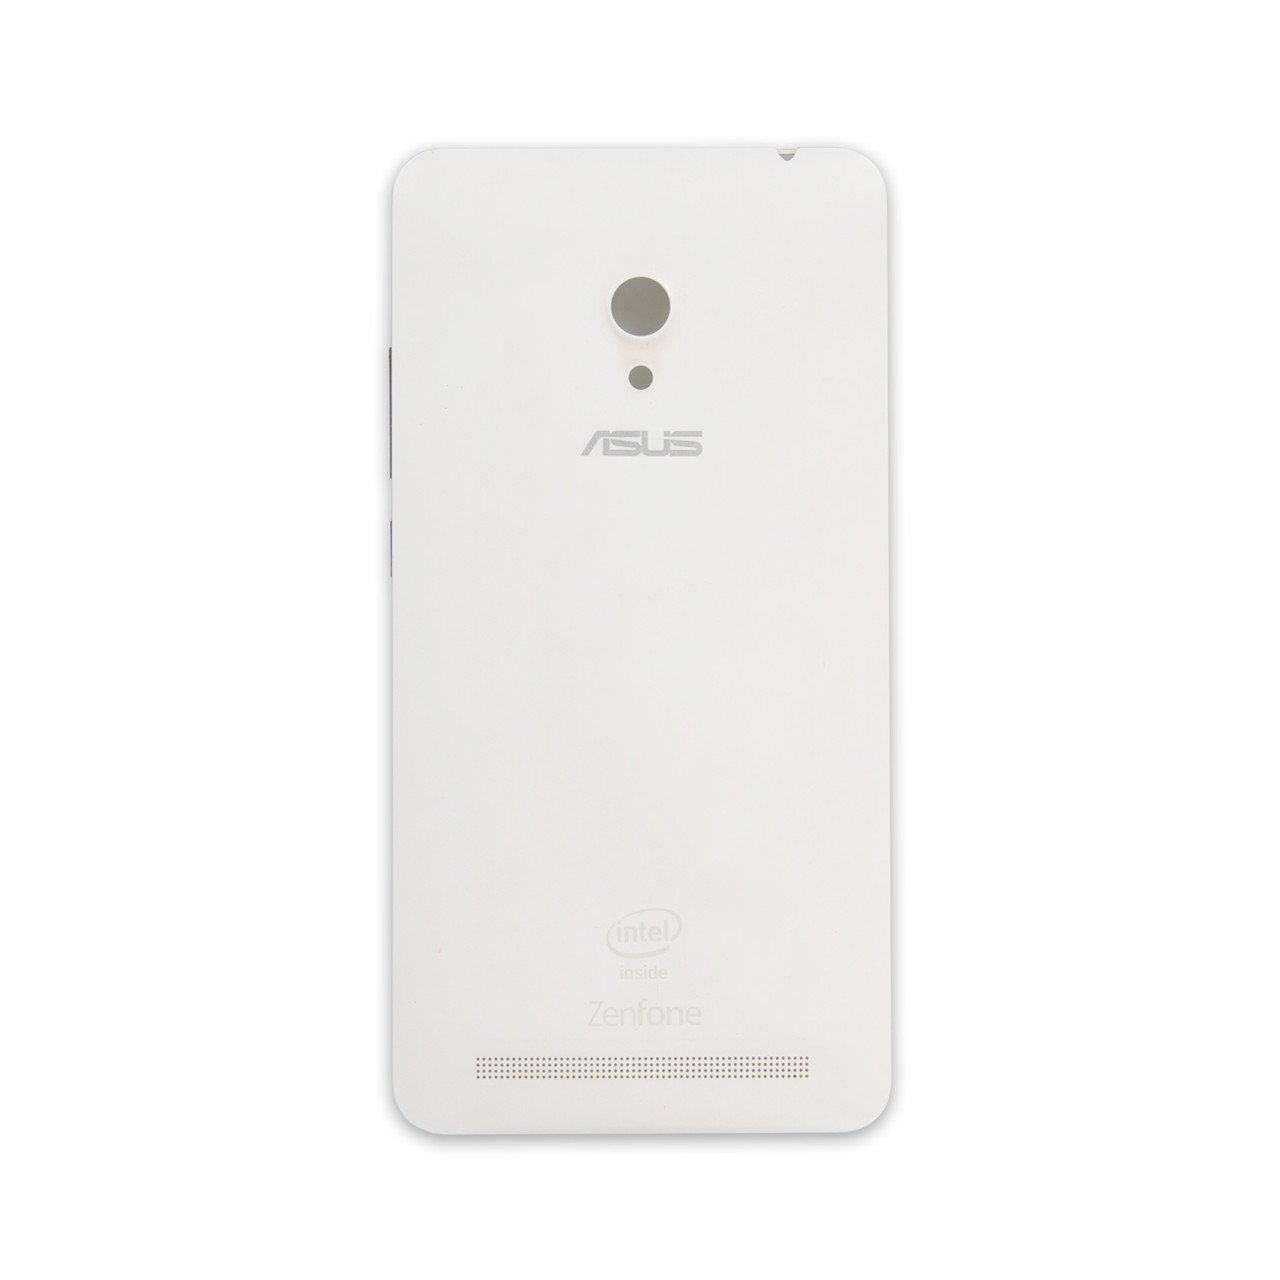 Задняя крышка ASUS Zenfone 6 белая (Б/У)